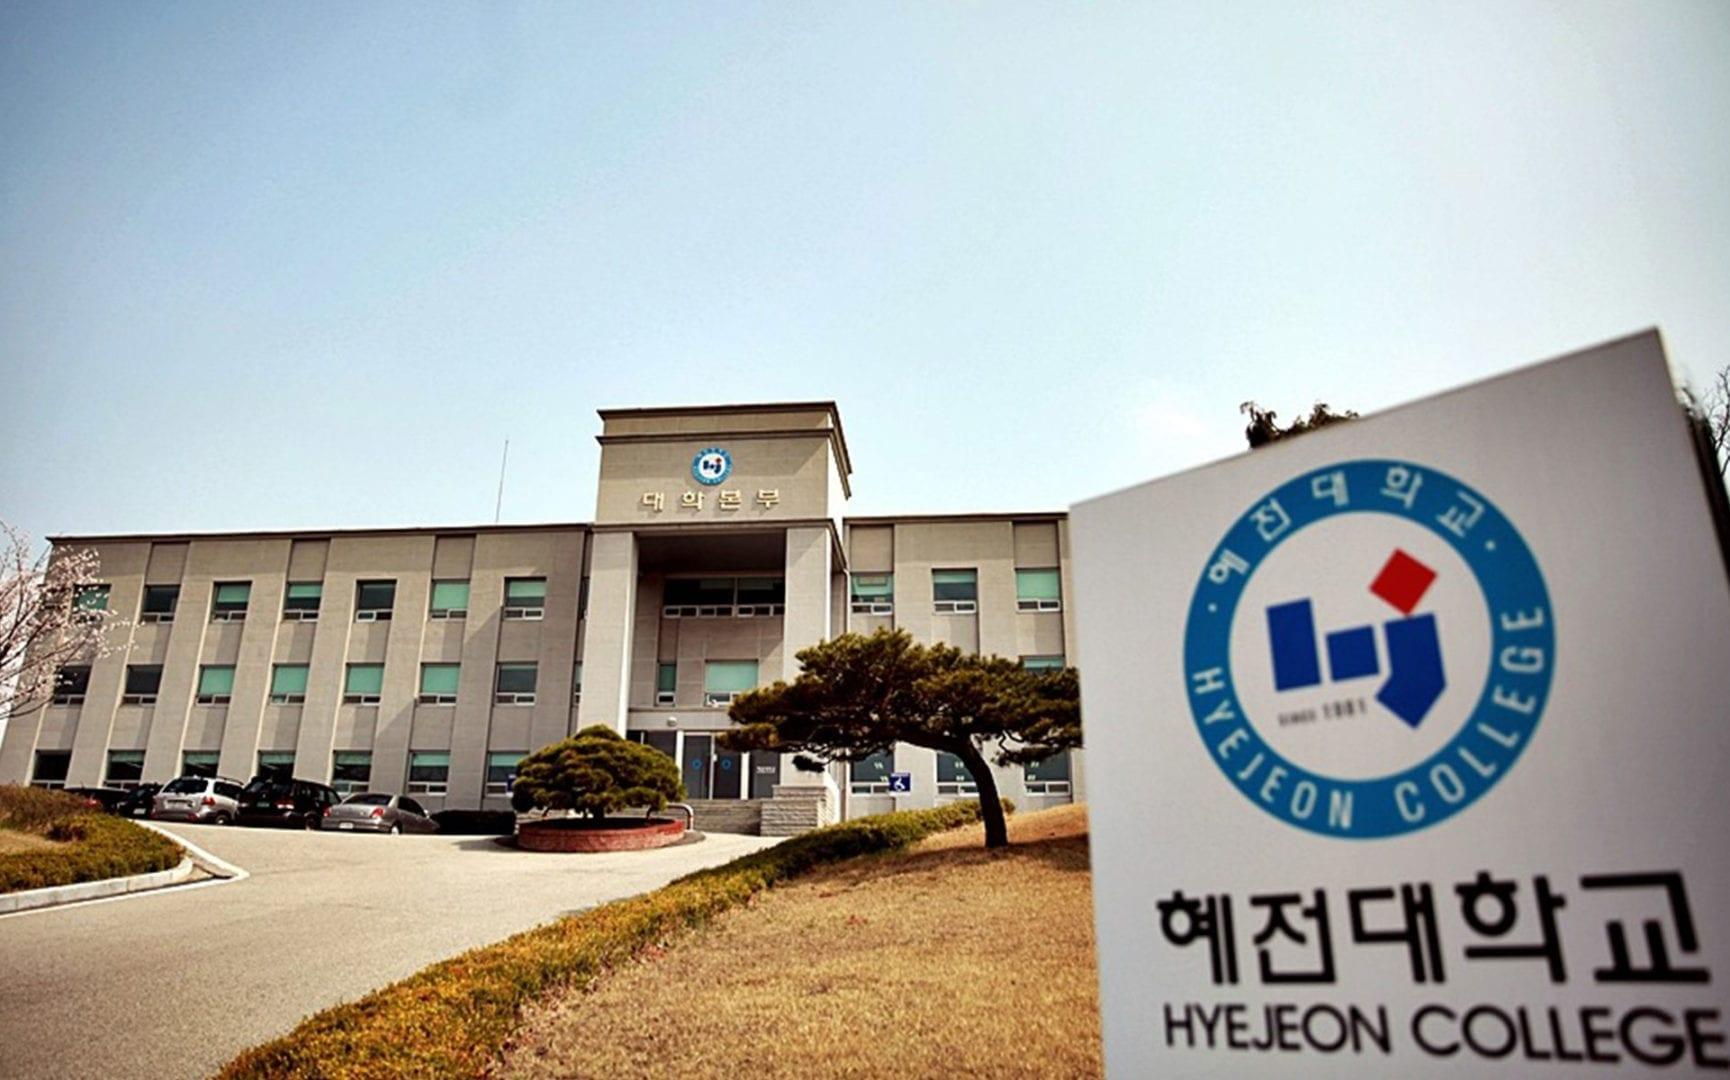 Hyjeon College